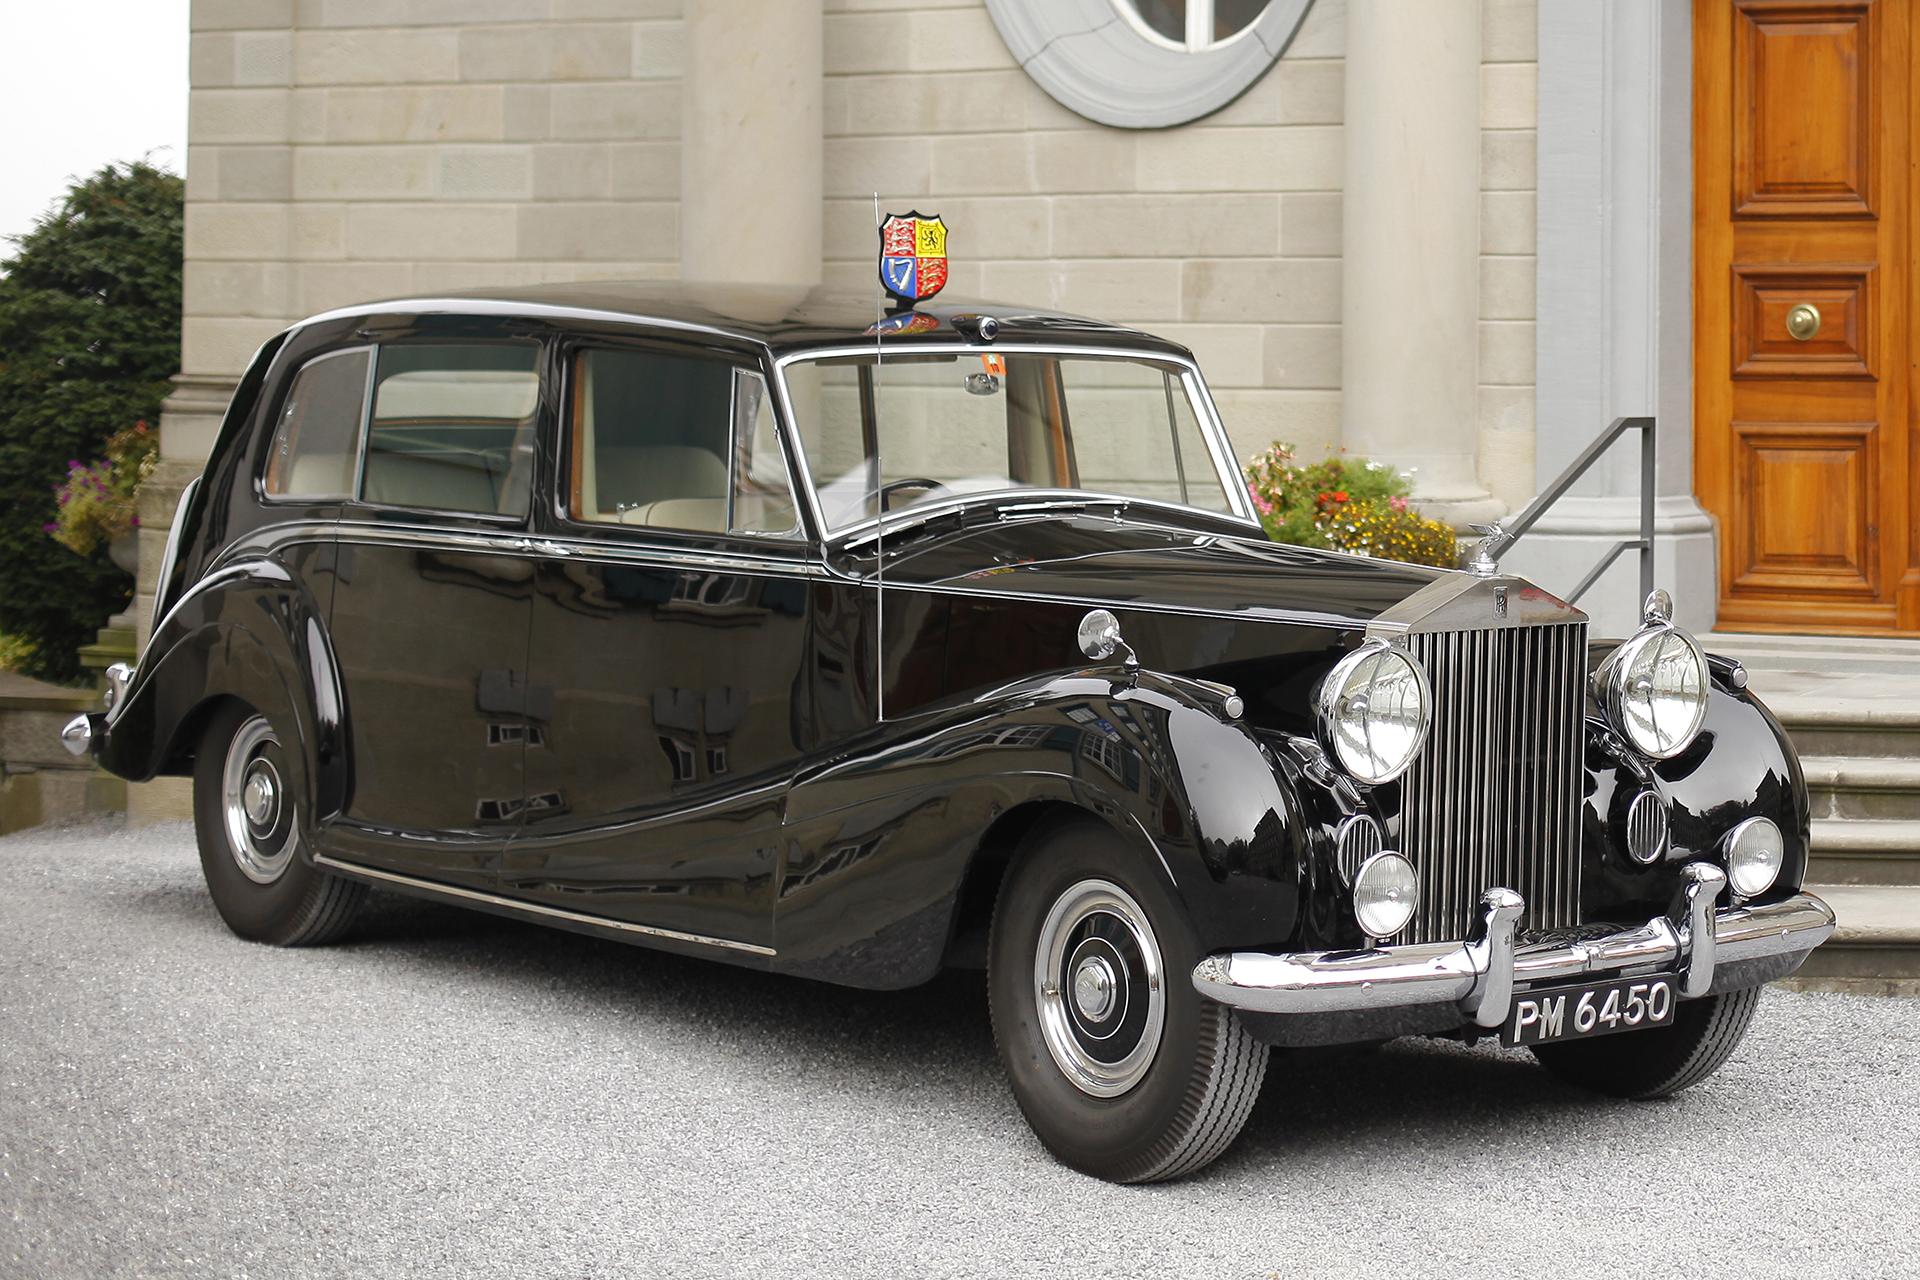 1954 Rolls-Royce-Phantom-IV-Limousine-'Princess-Margaret'